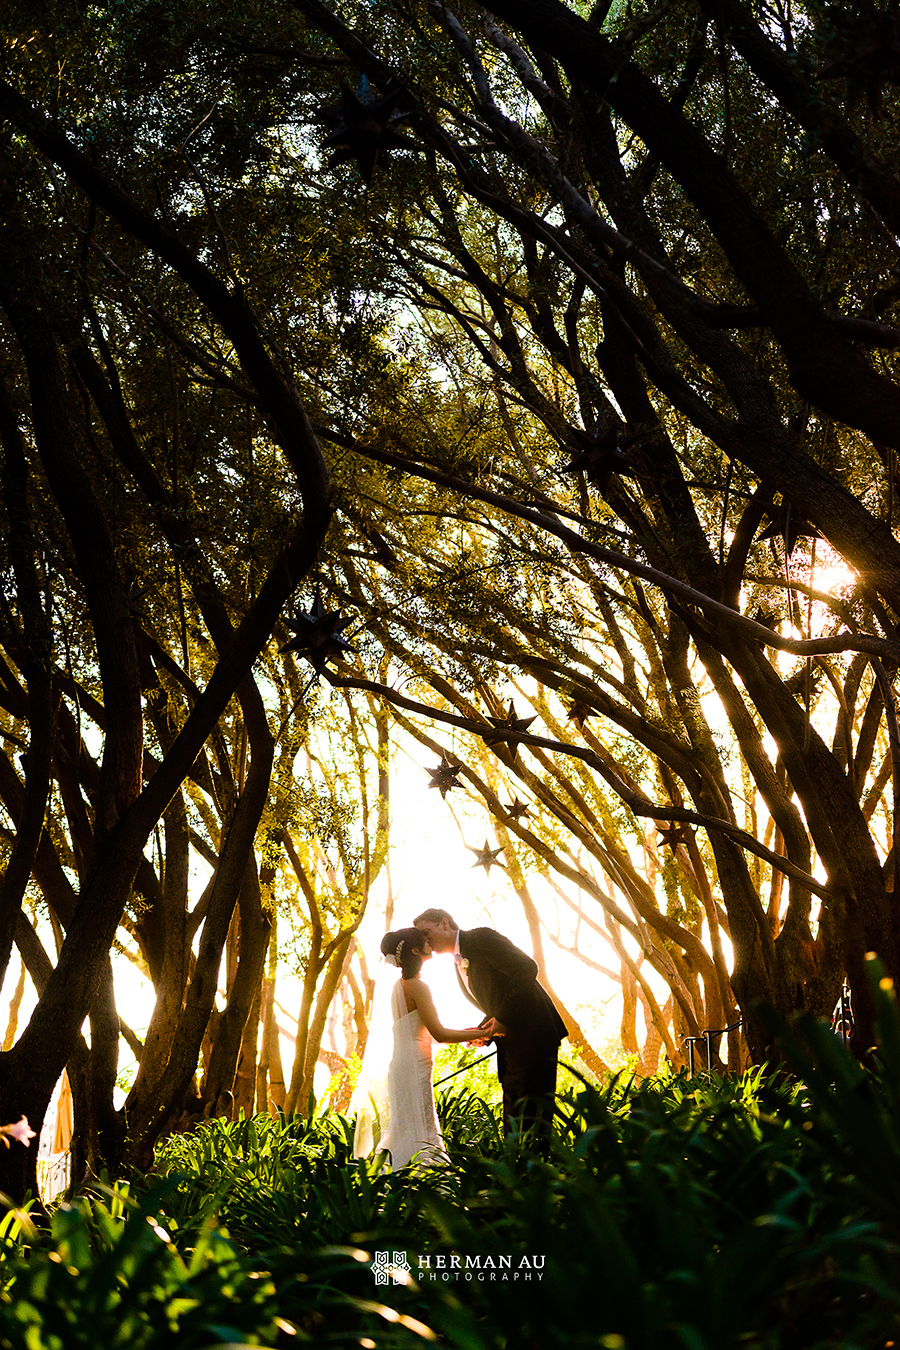 21.Padua Hills Theatre couple wedding bridal portrait forest trees stars